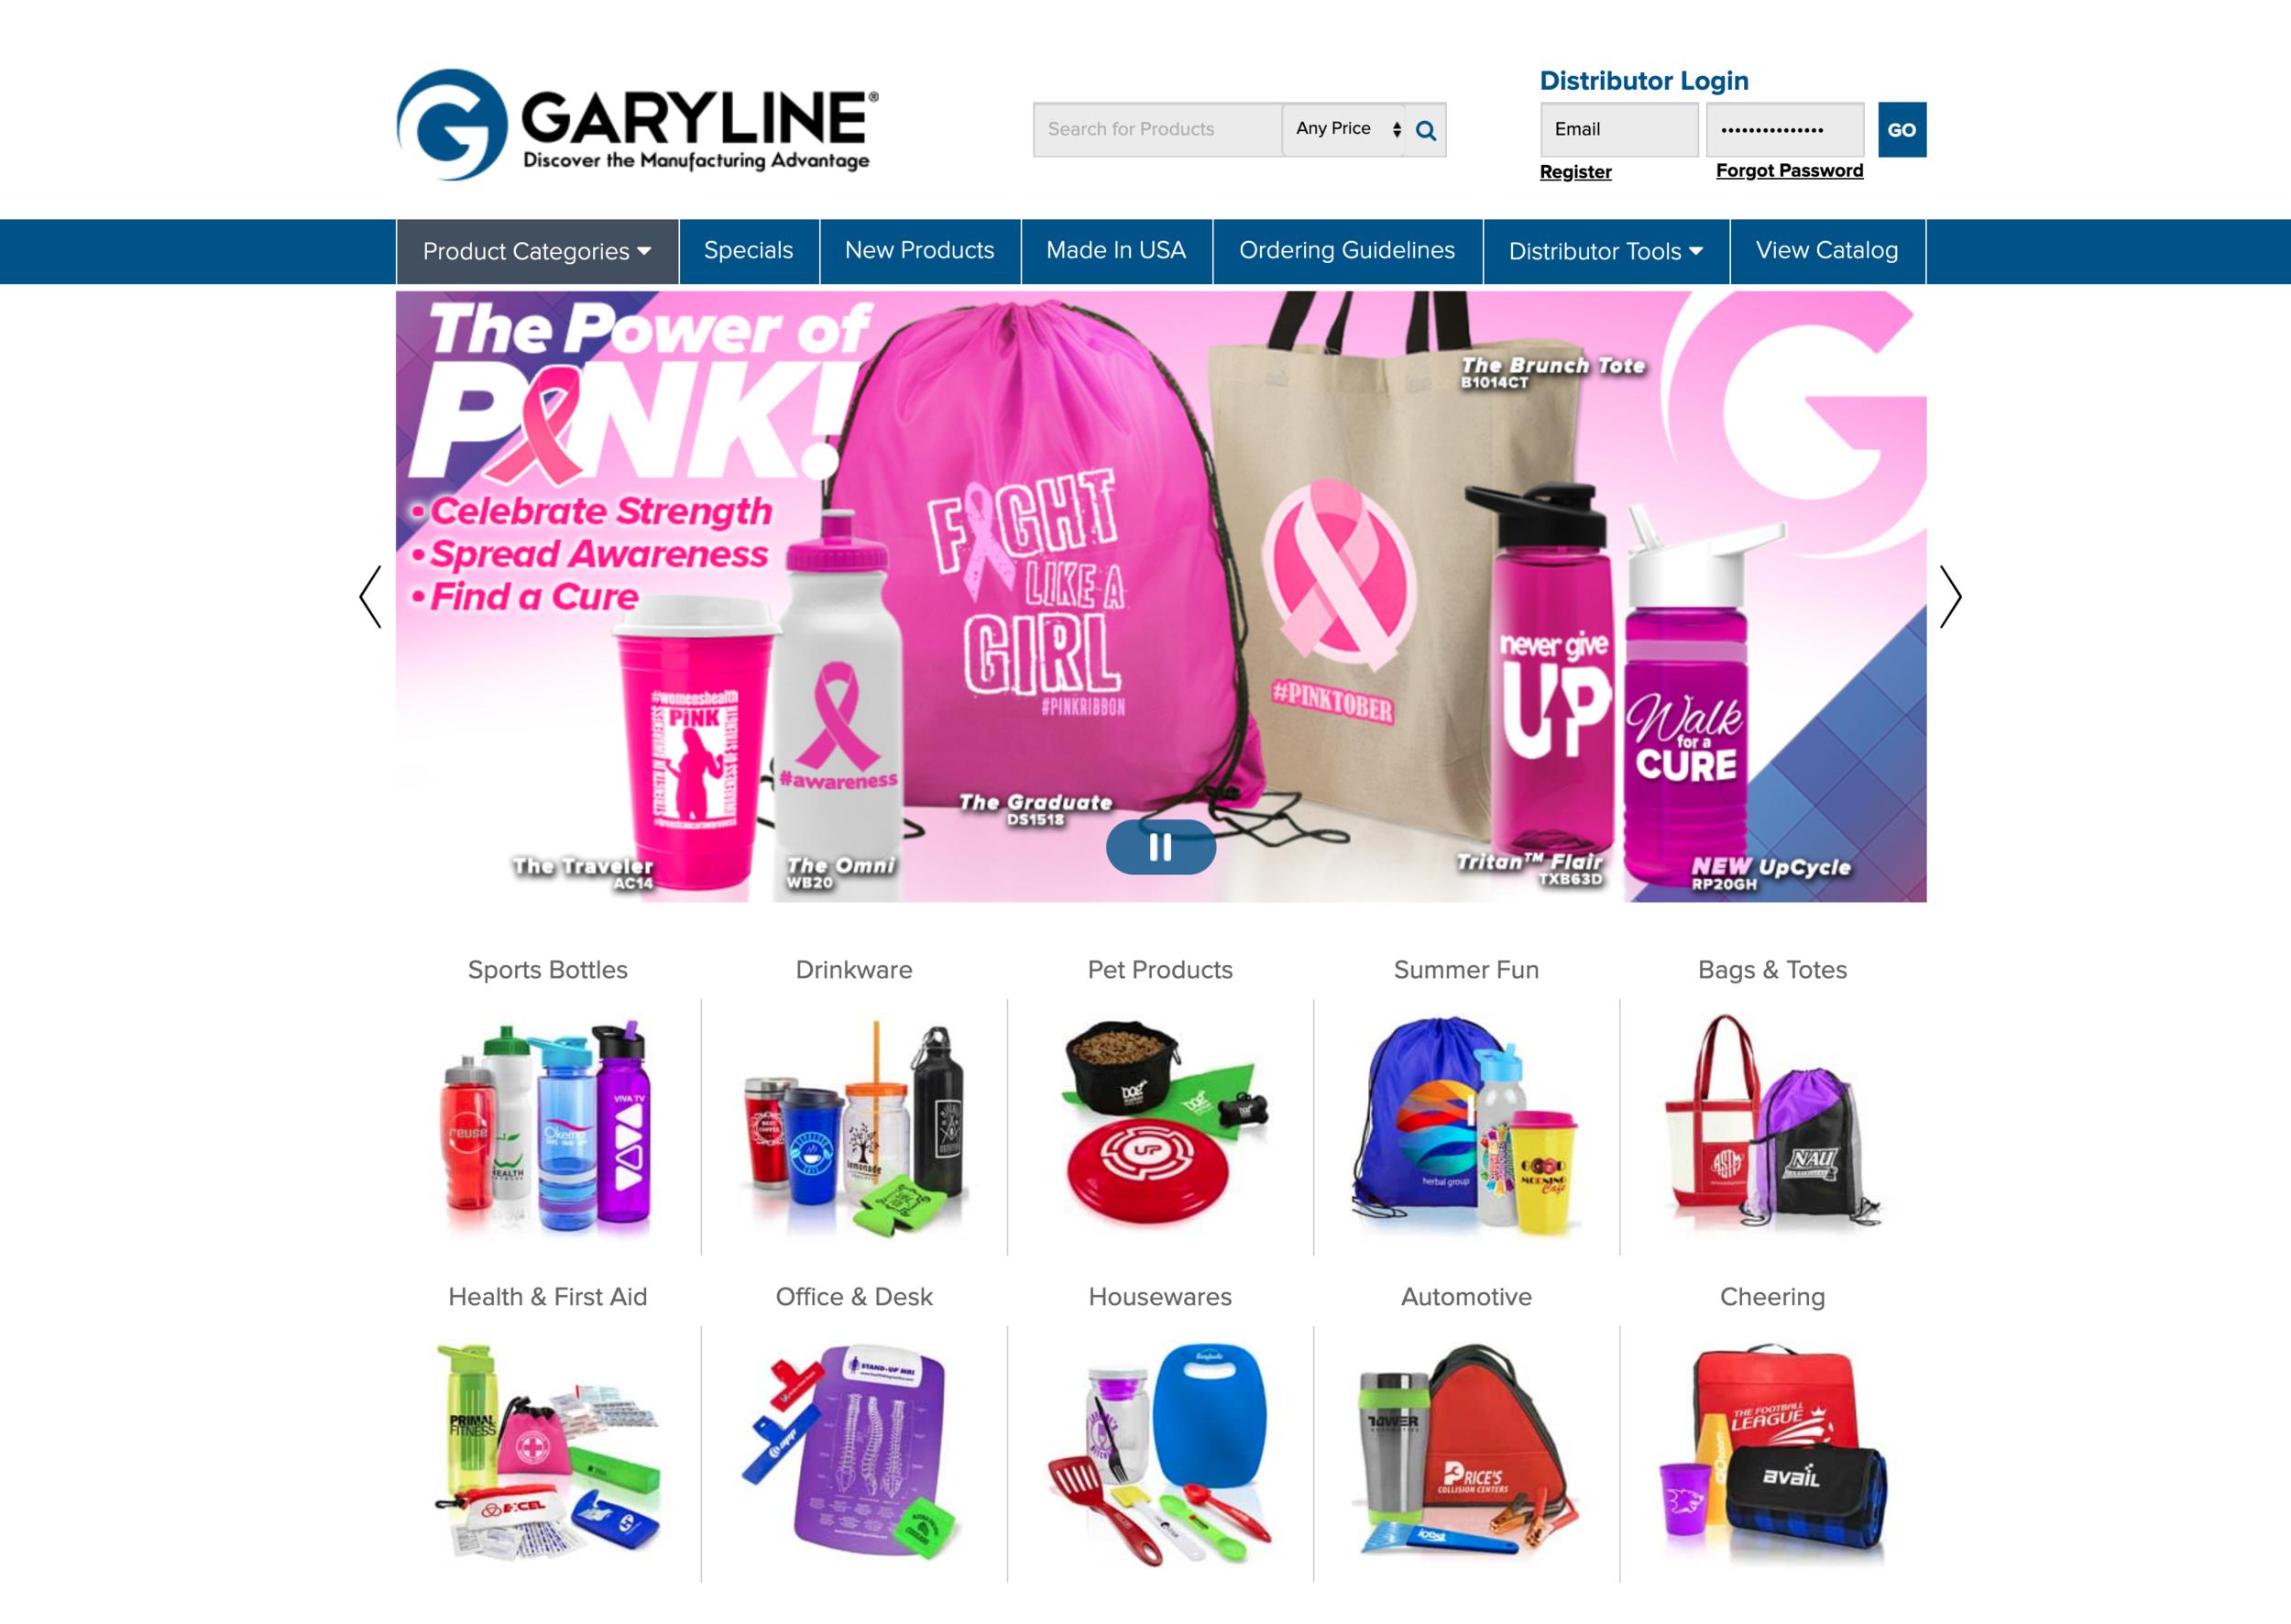 Garyline